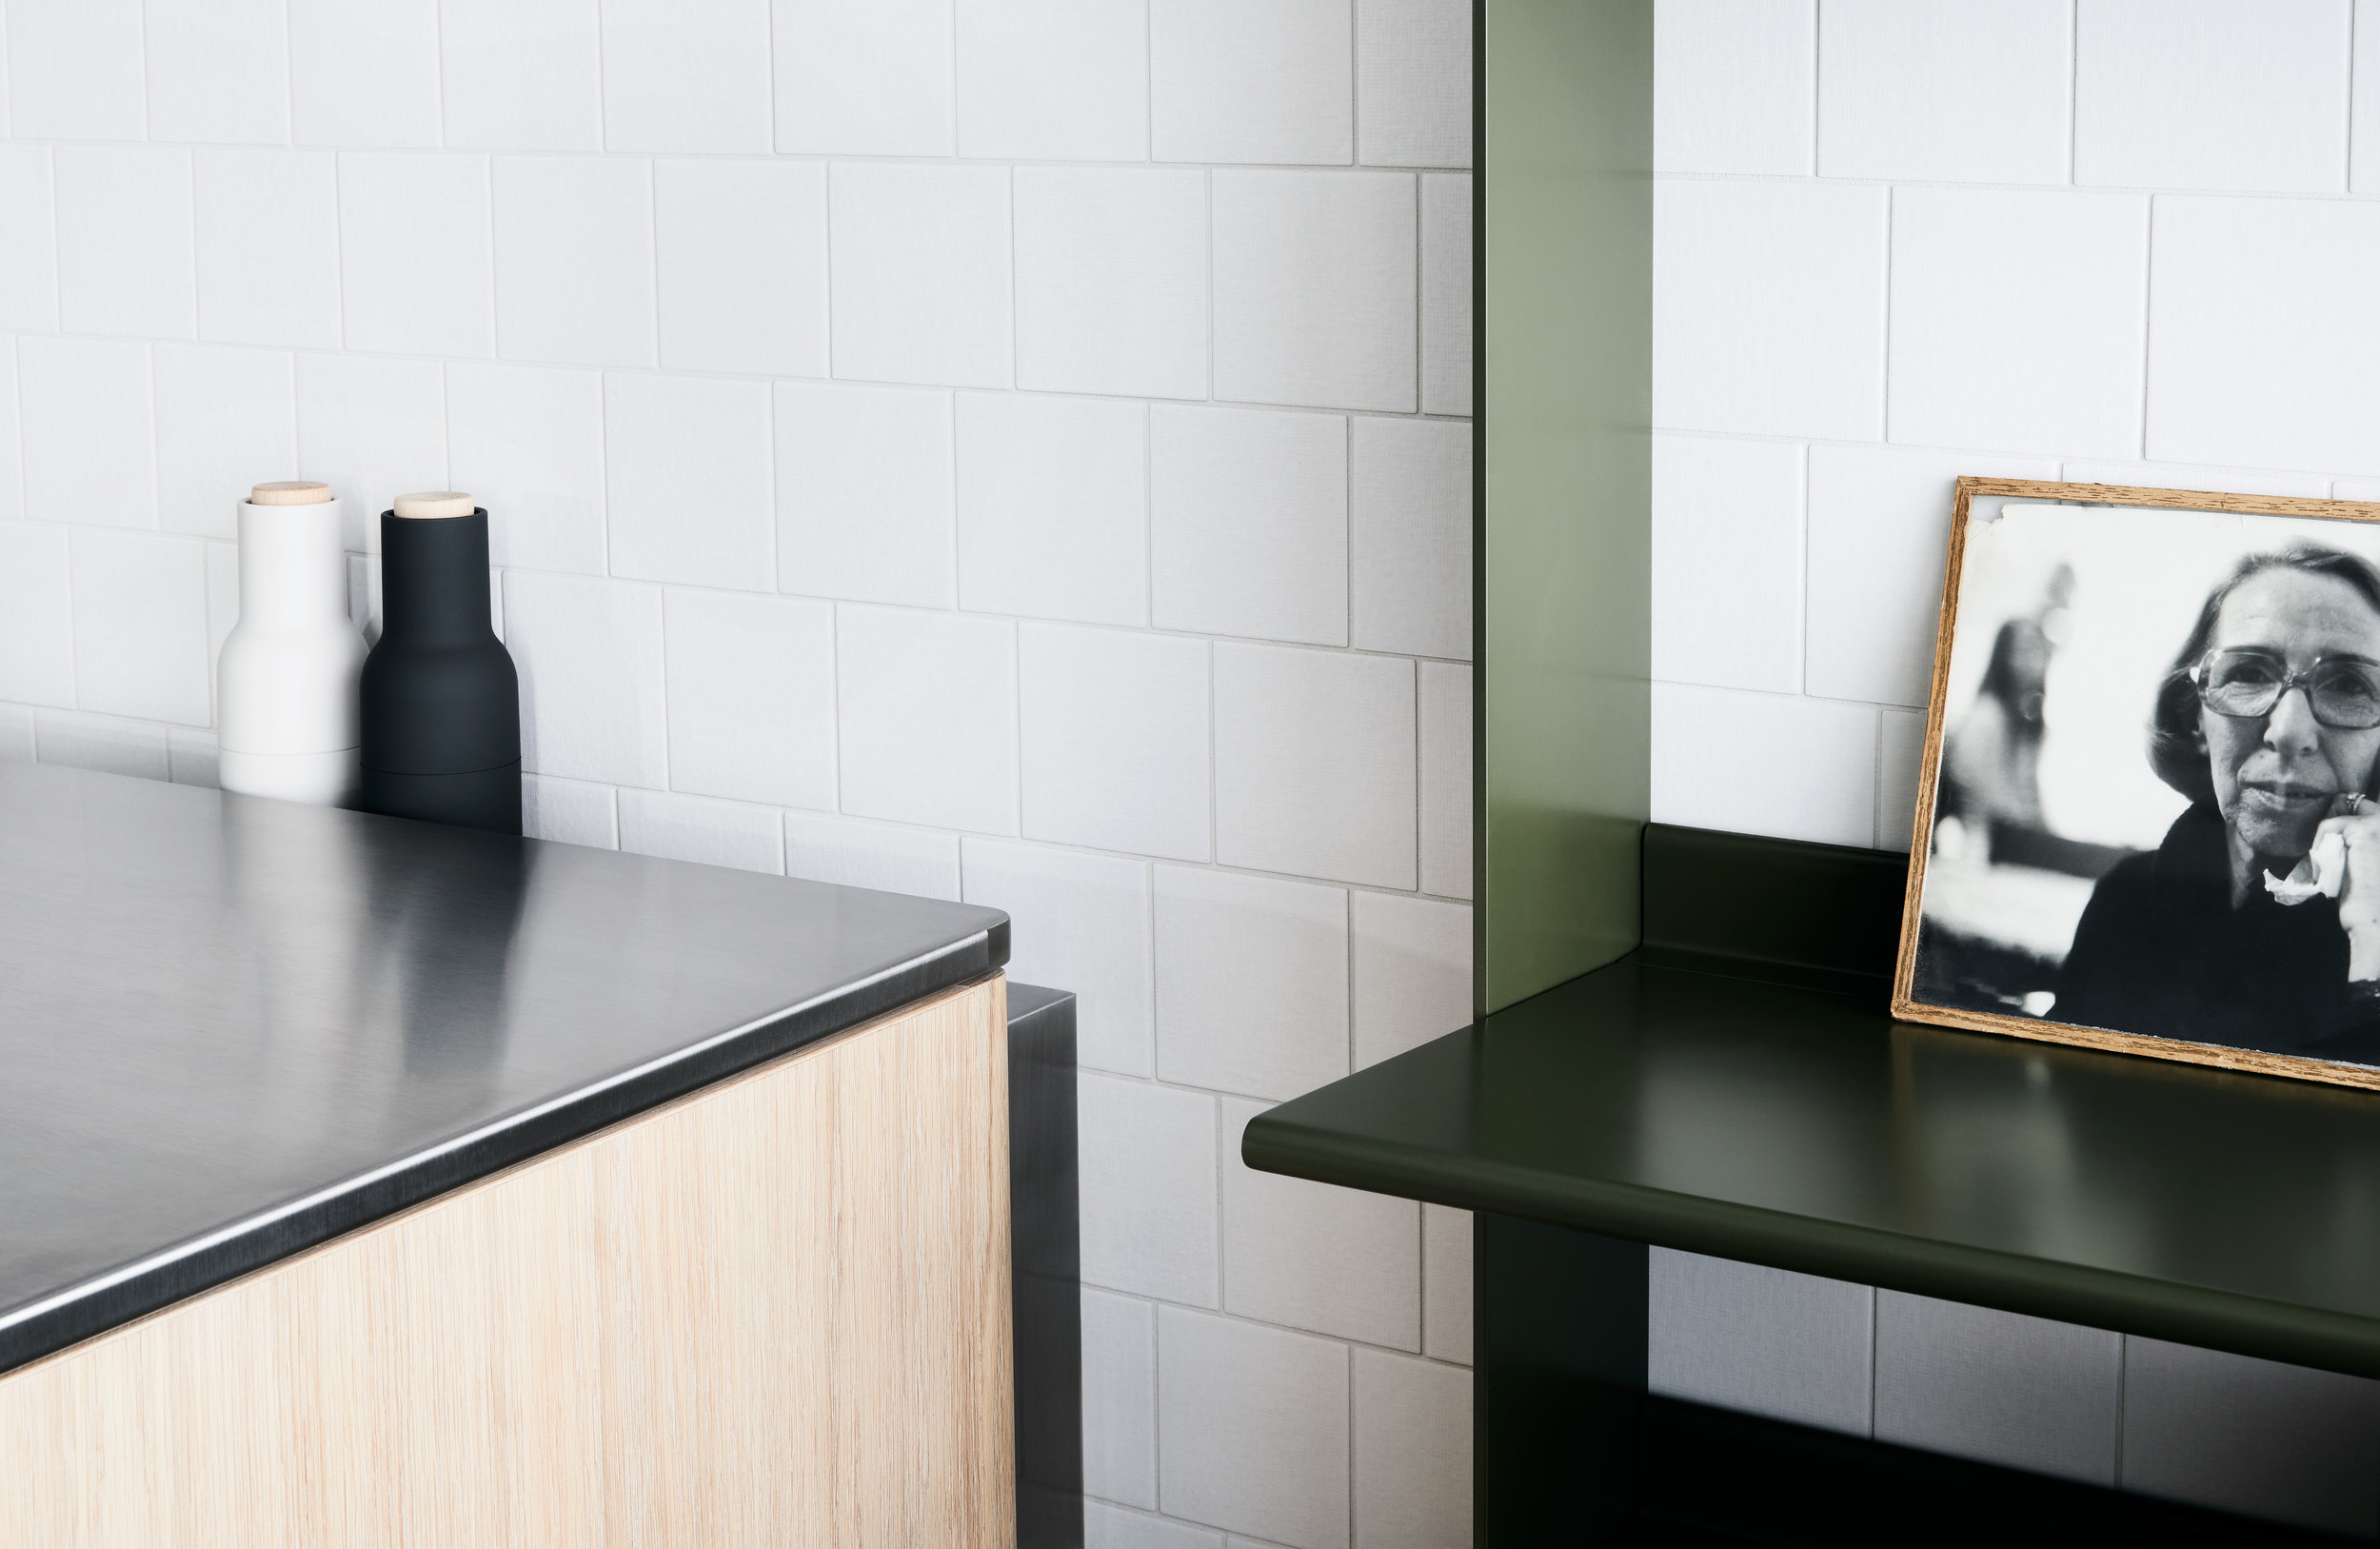 Tableau Cantilever DesignOffice Kitchen System Australia (5).jpg